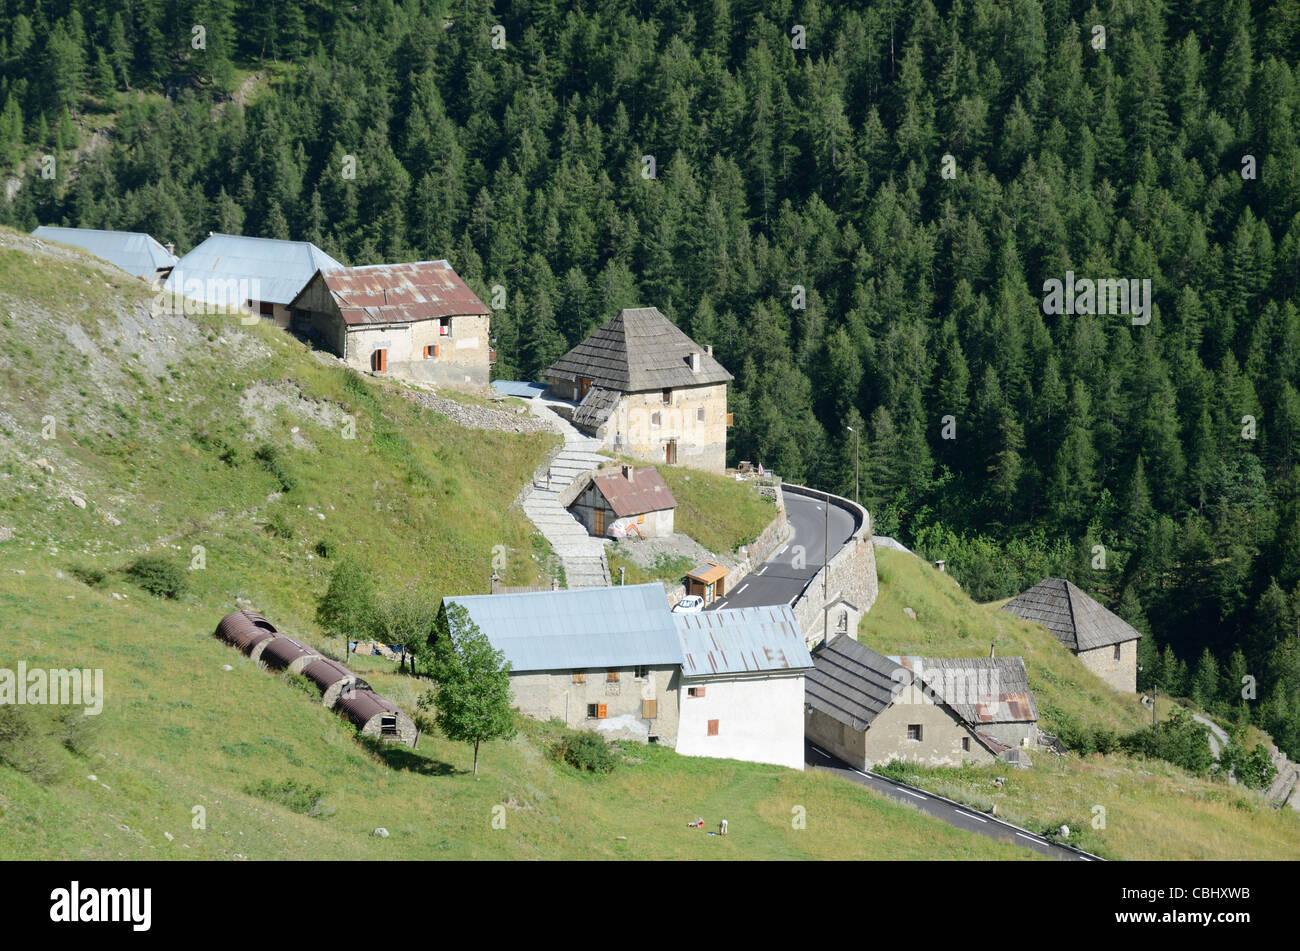 Alpine Village or Hamlet of Bousieyas, on the Southern Side of the Route de la Bonette, Tinée Valley, Alpes - Stock Image